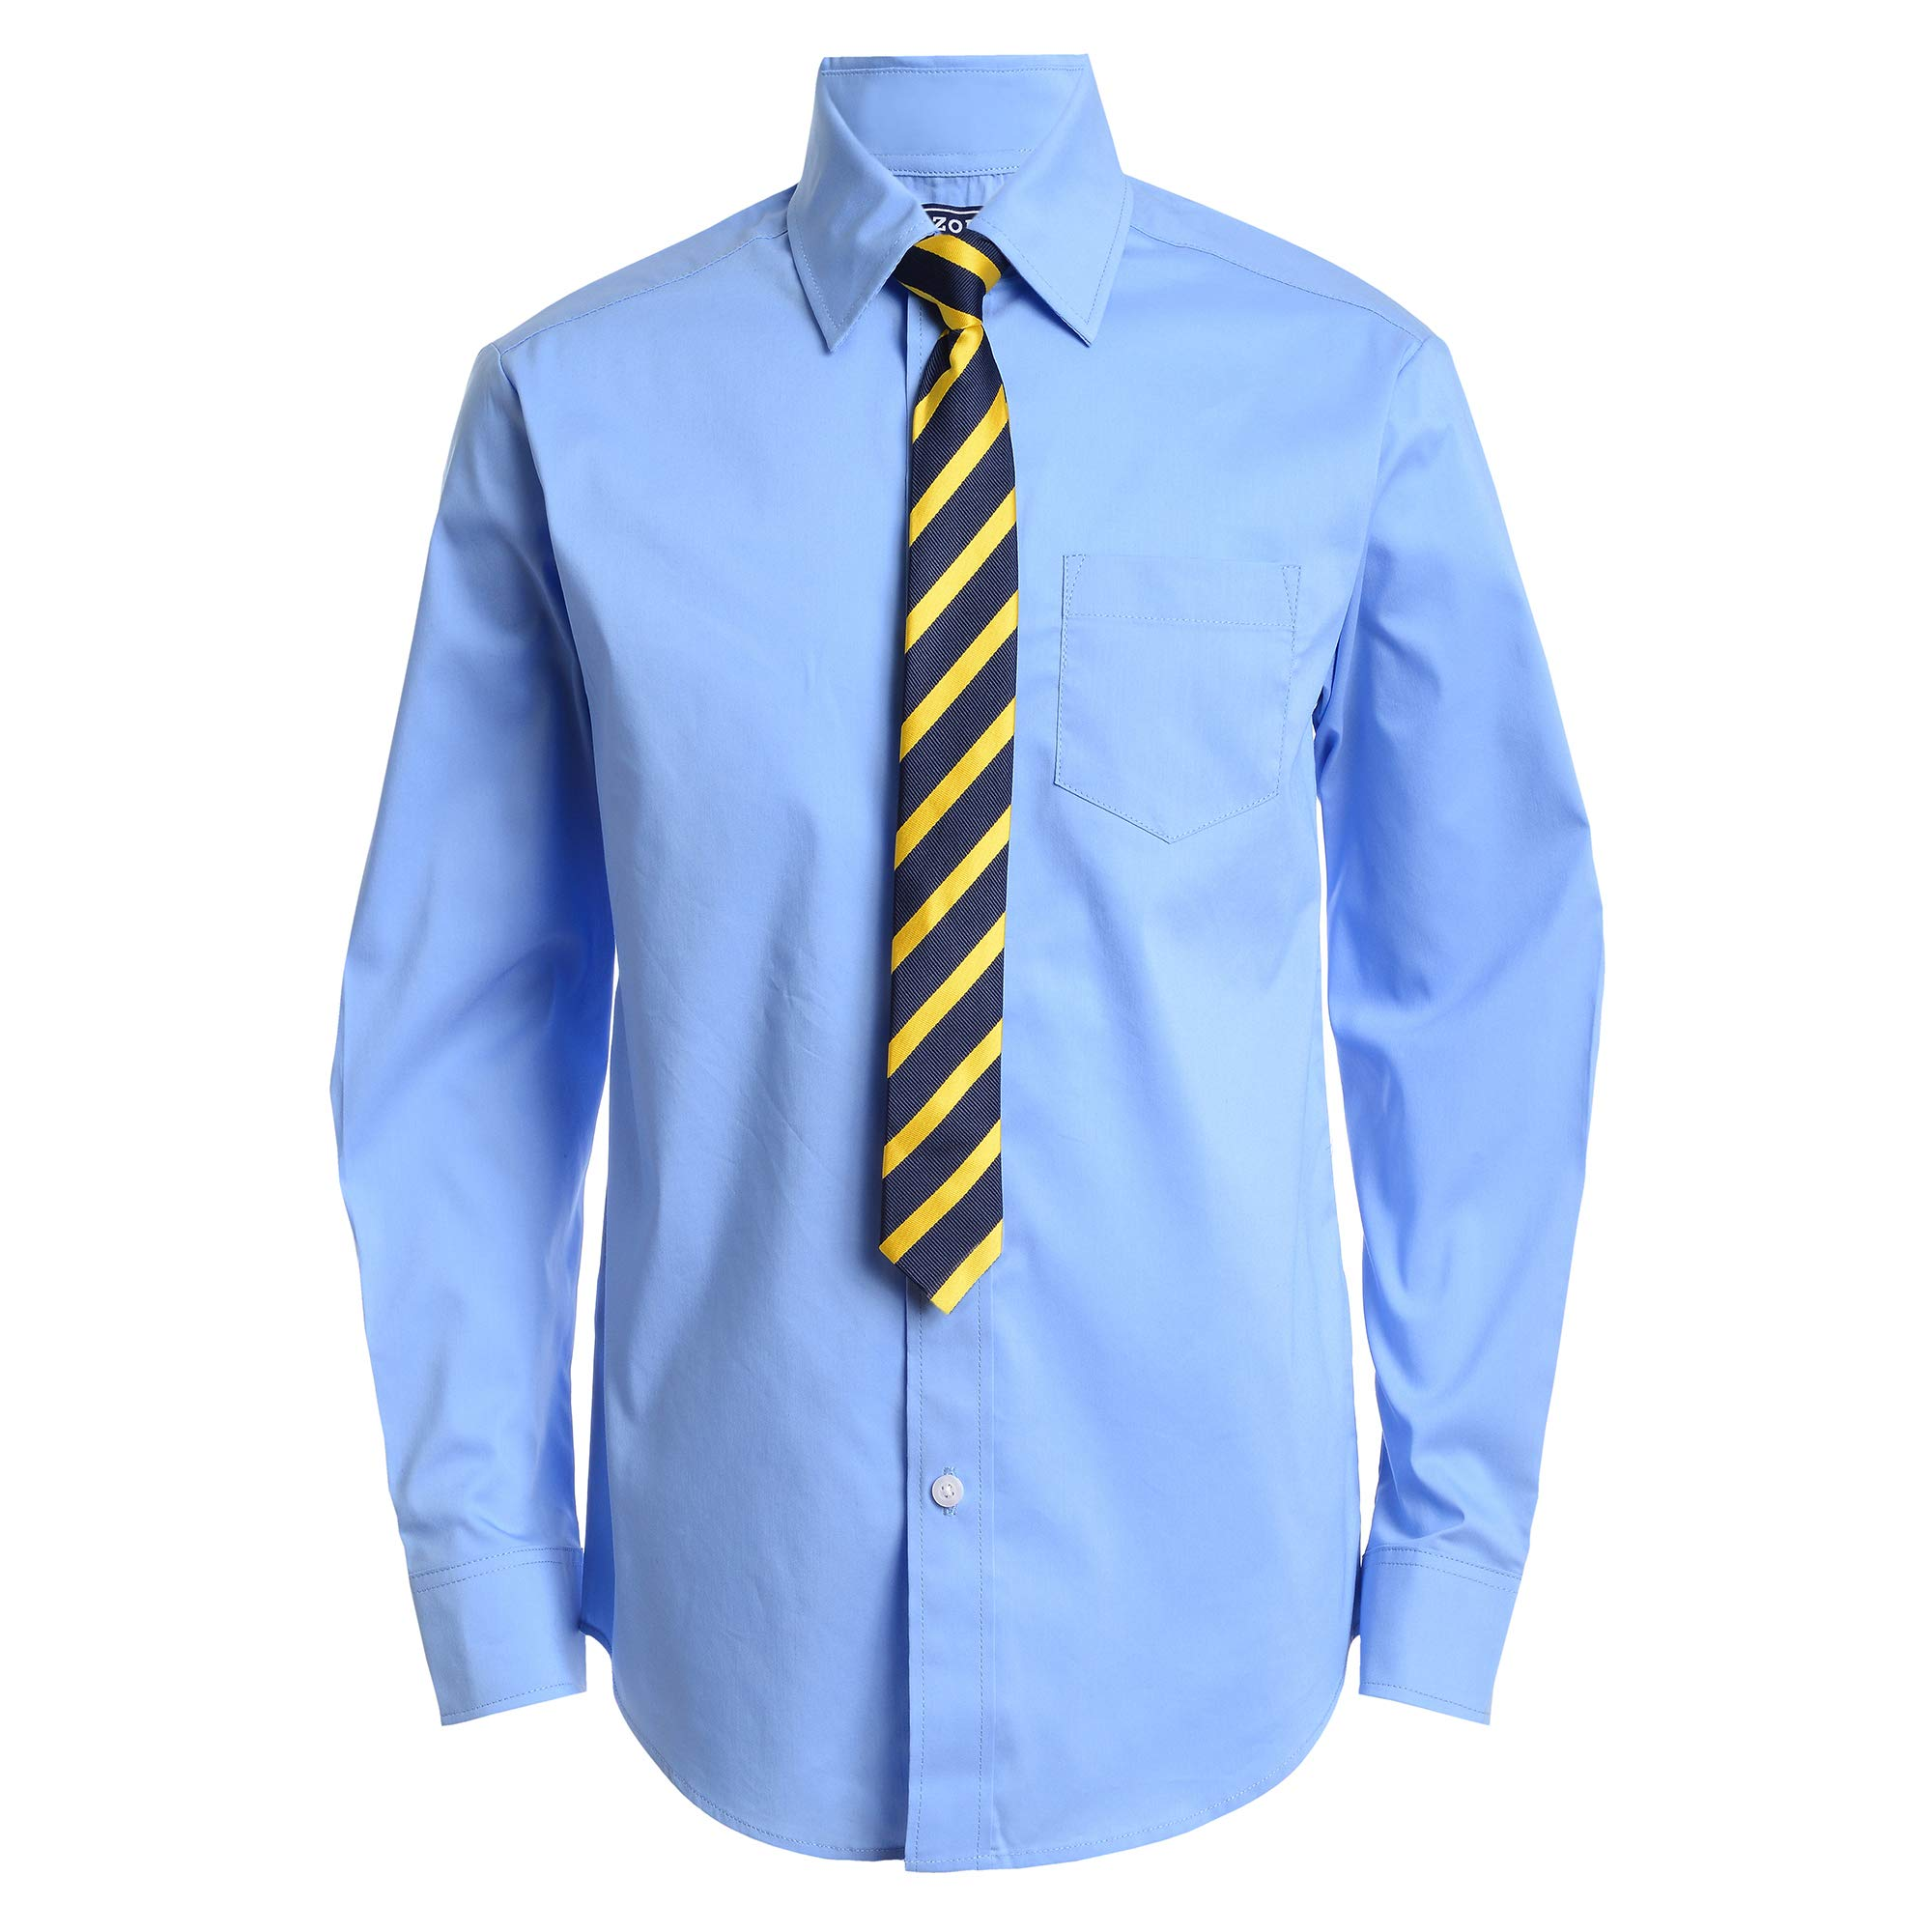 IZOD Boys' Big Long Sleeve Dress Shirt with Tie, Ocean View, 10